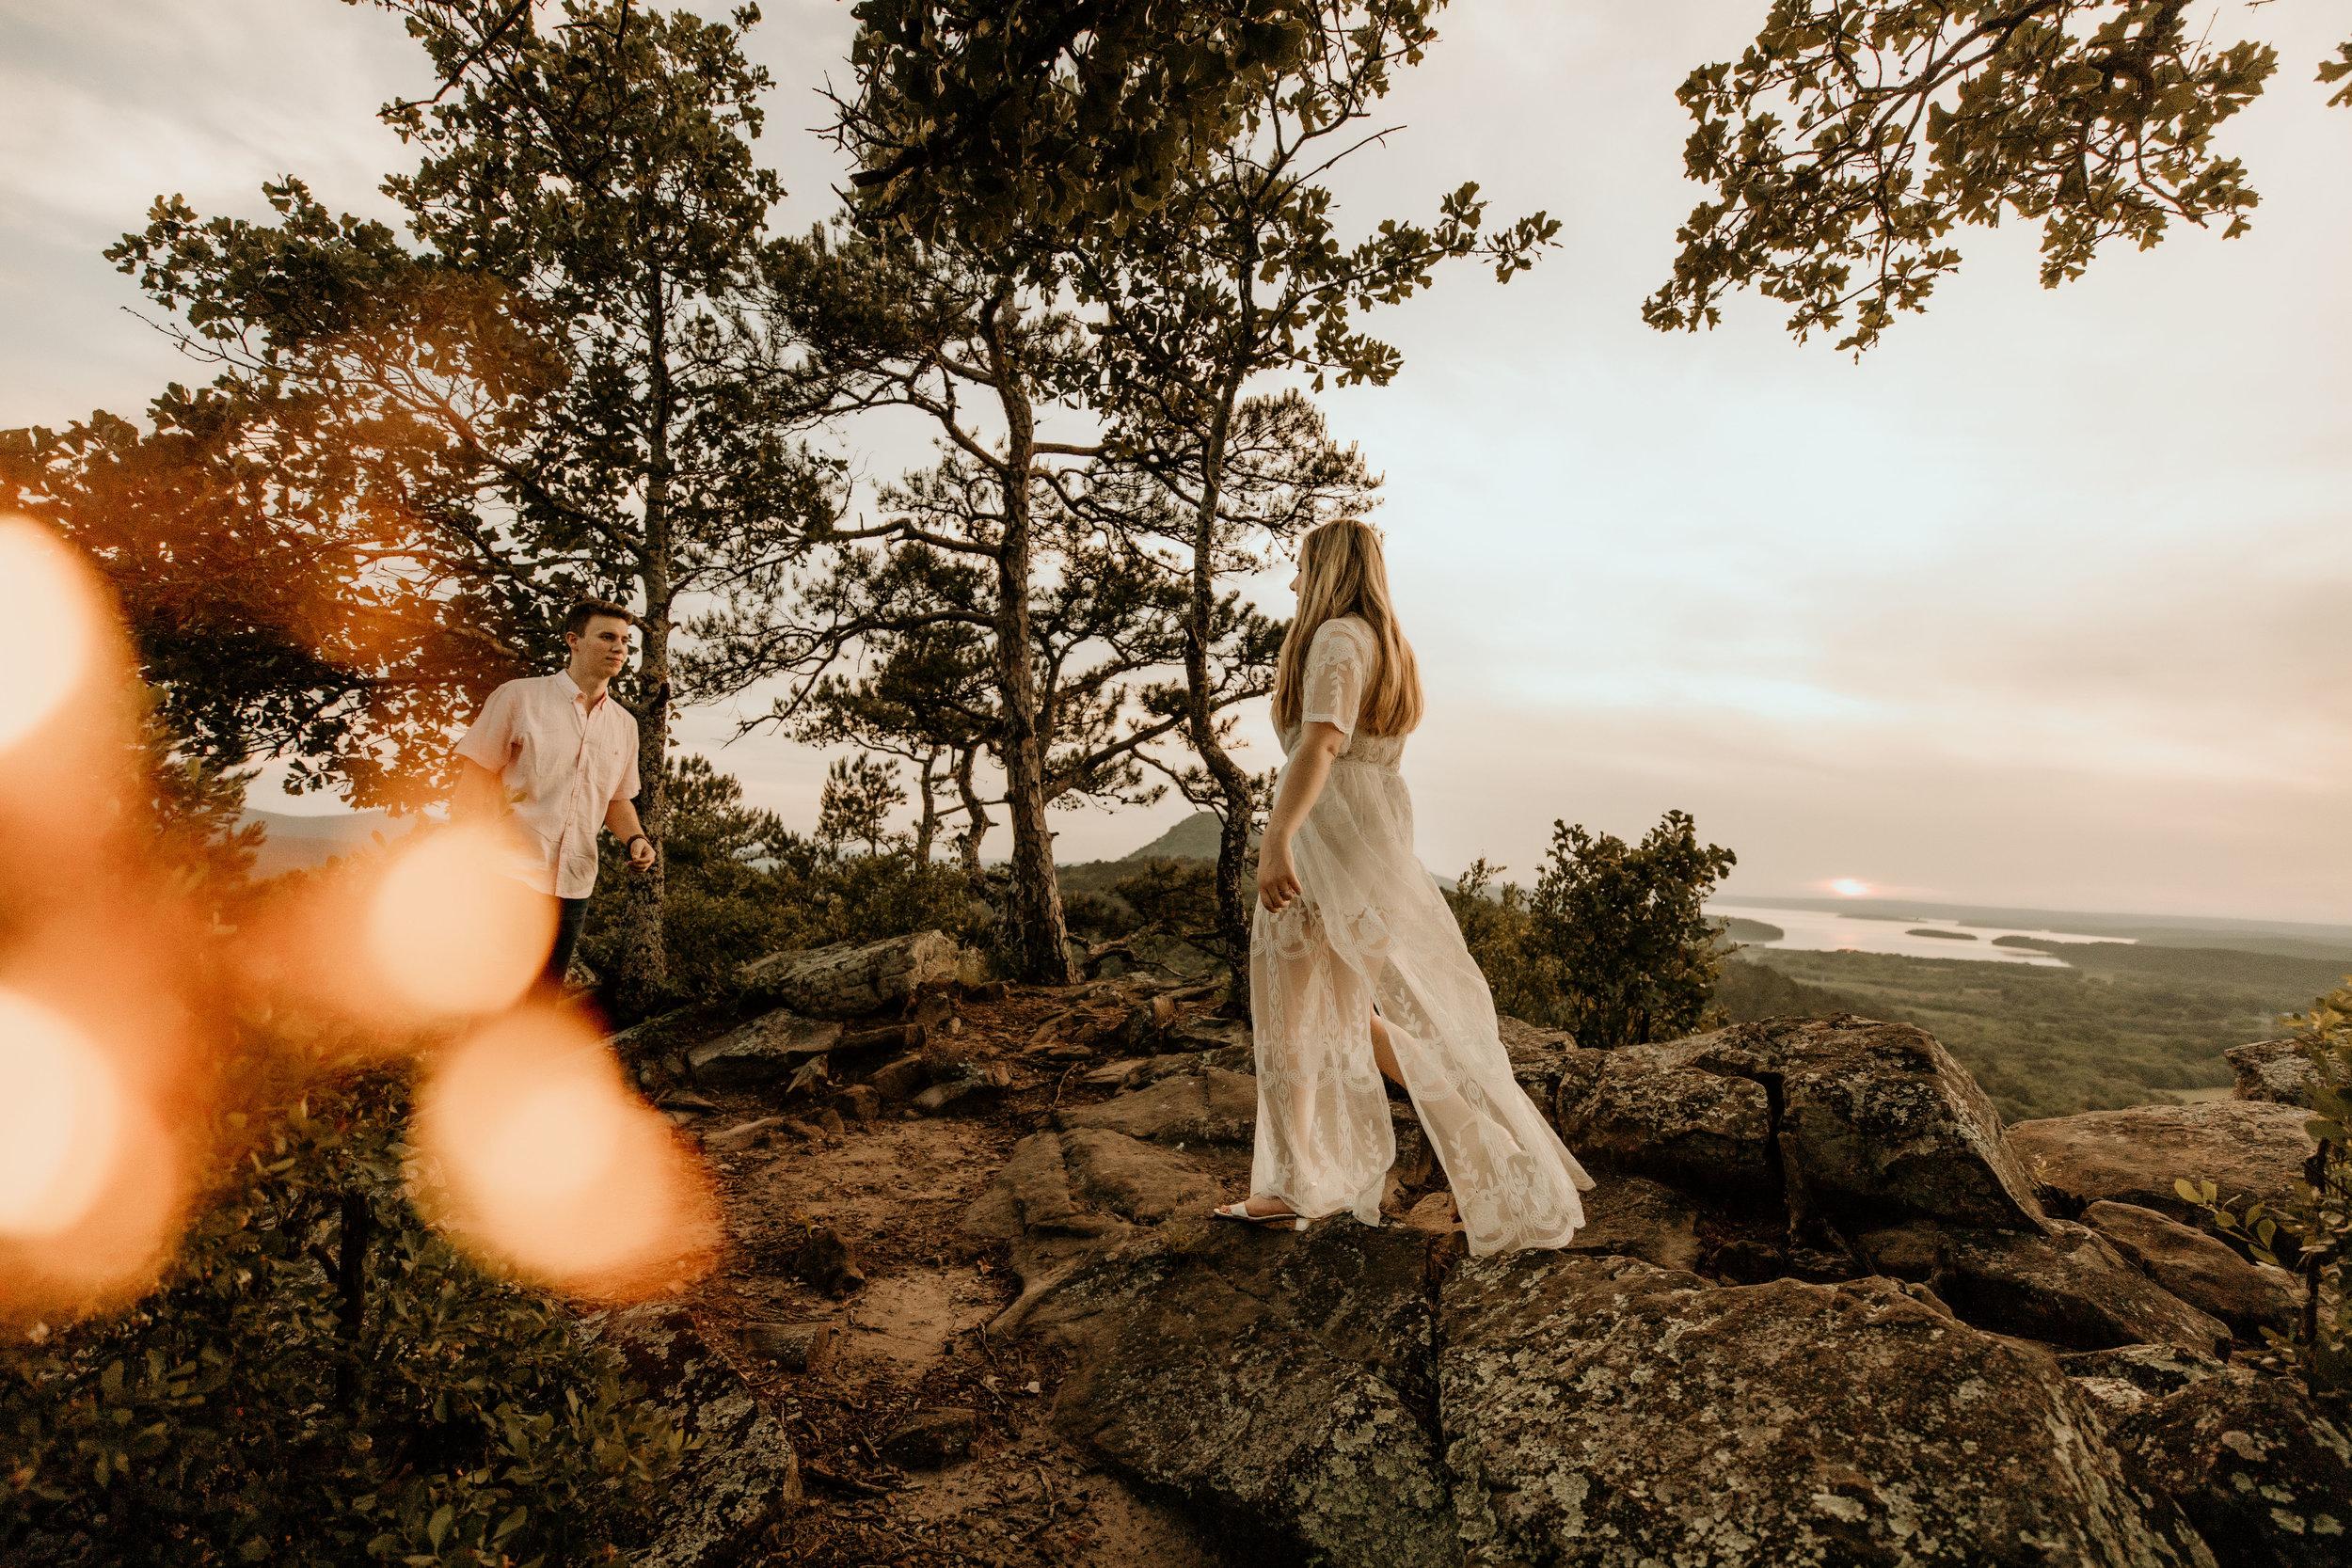 pinnacle-mountain-wedding-elopement-little-rock-arkansas-photographer-erin-venable-photography-bride-engagement-7526.jpg